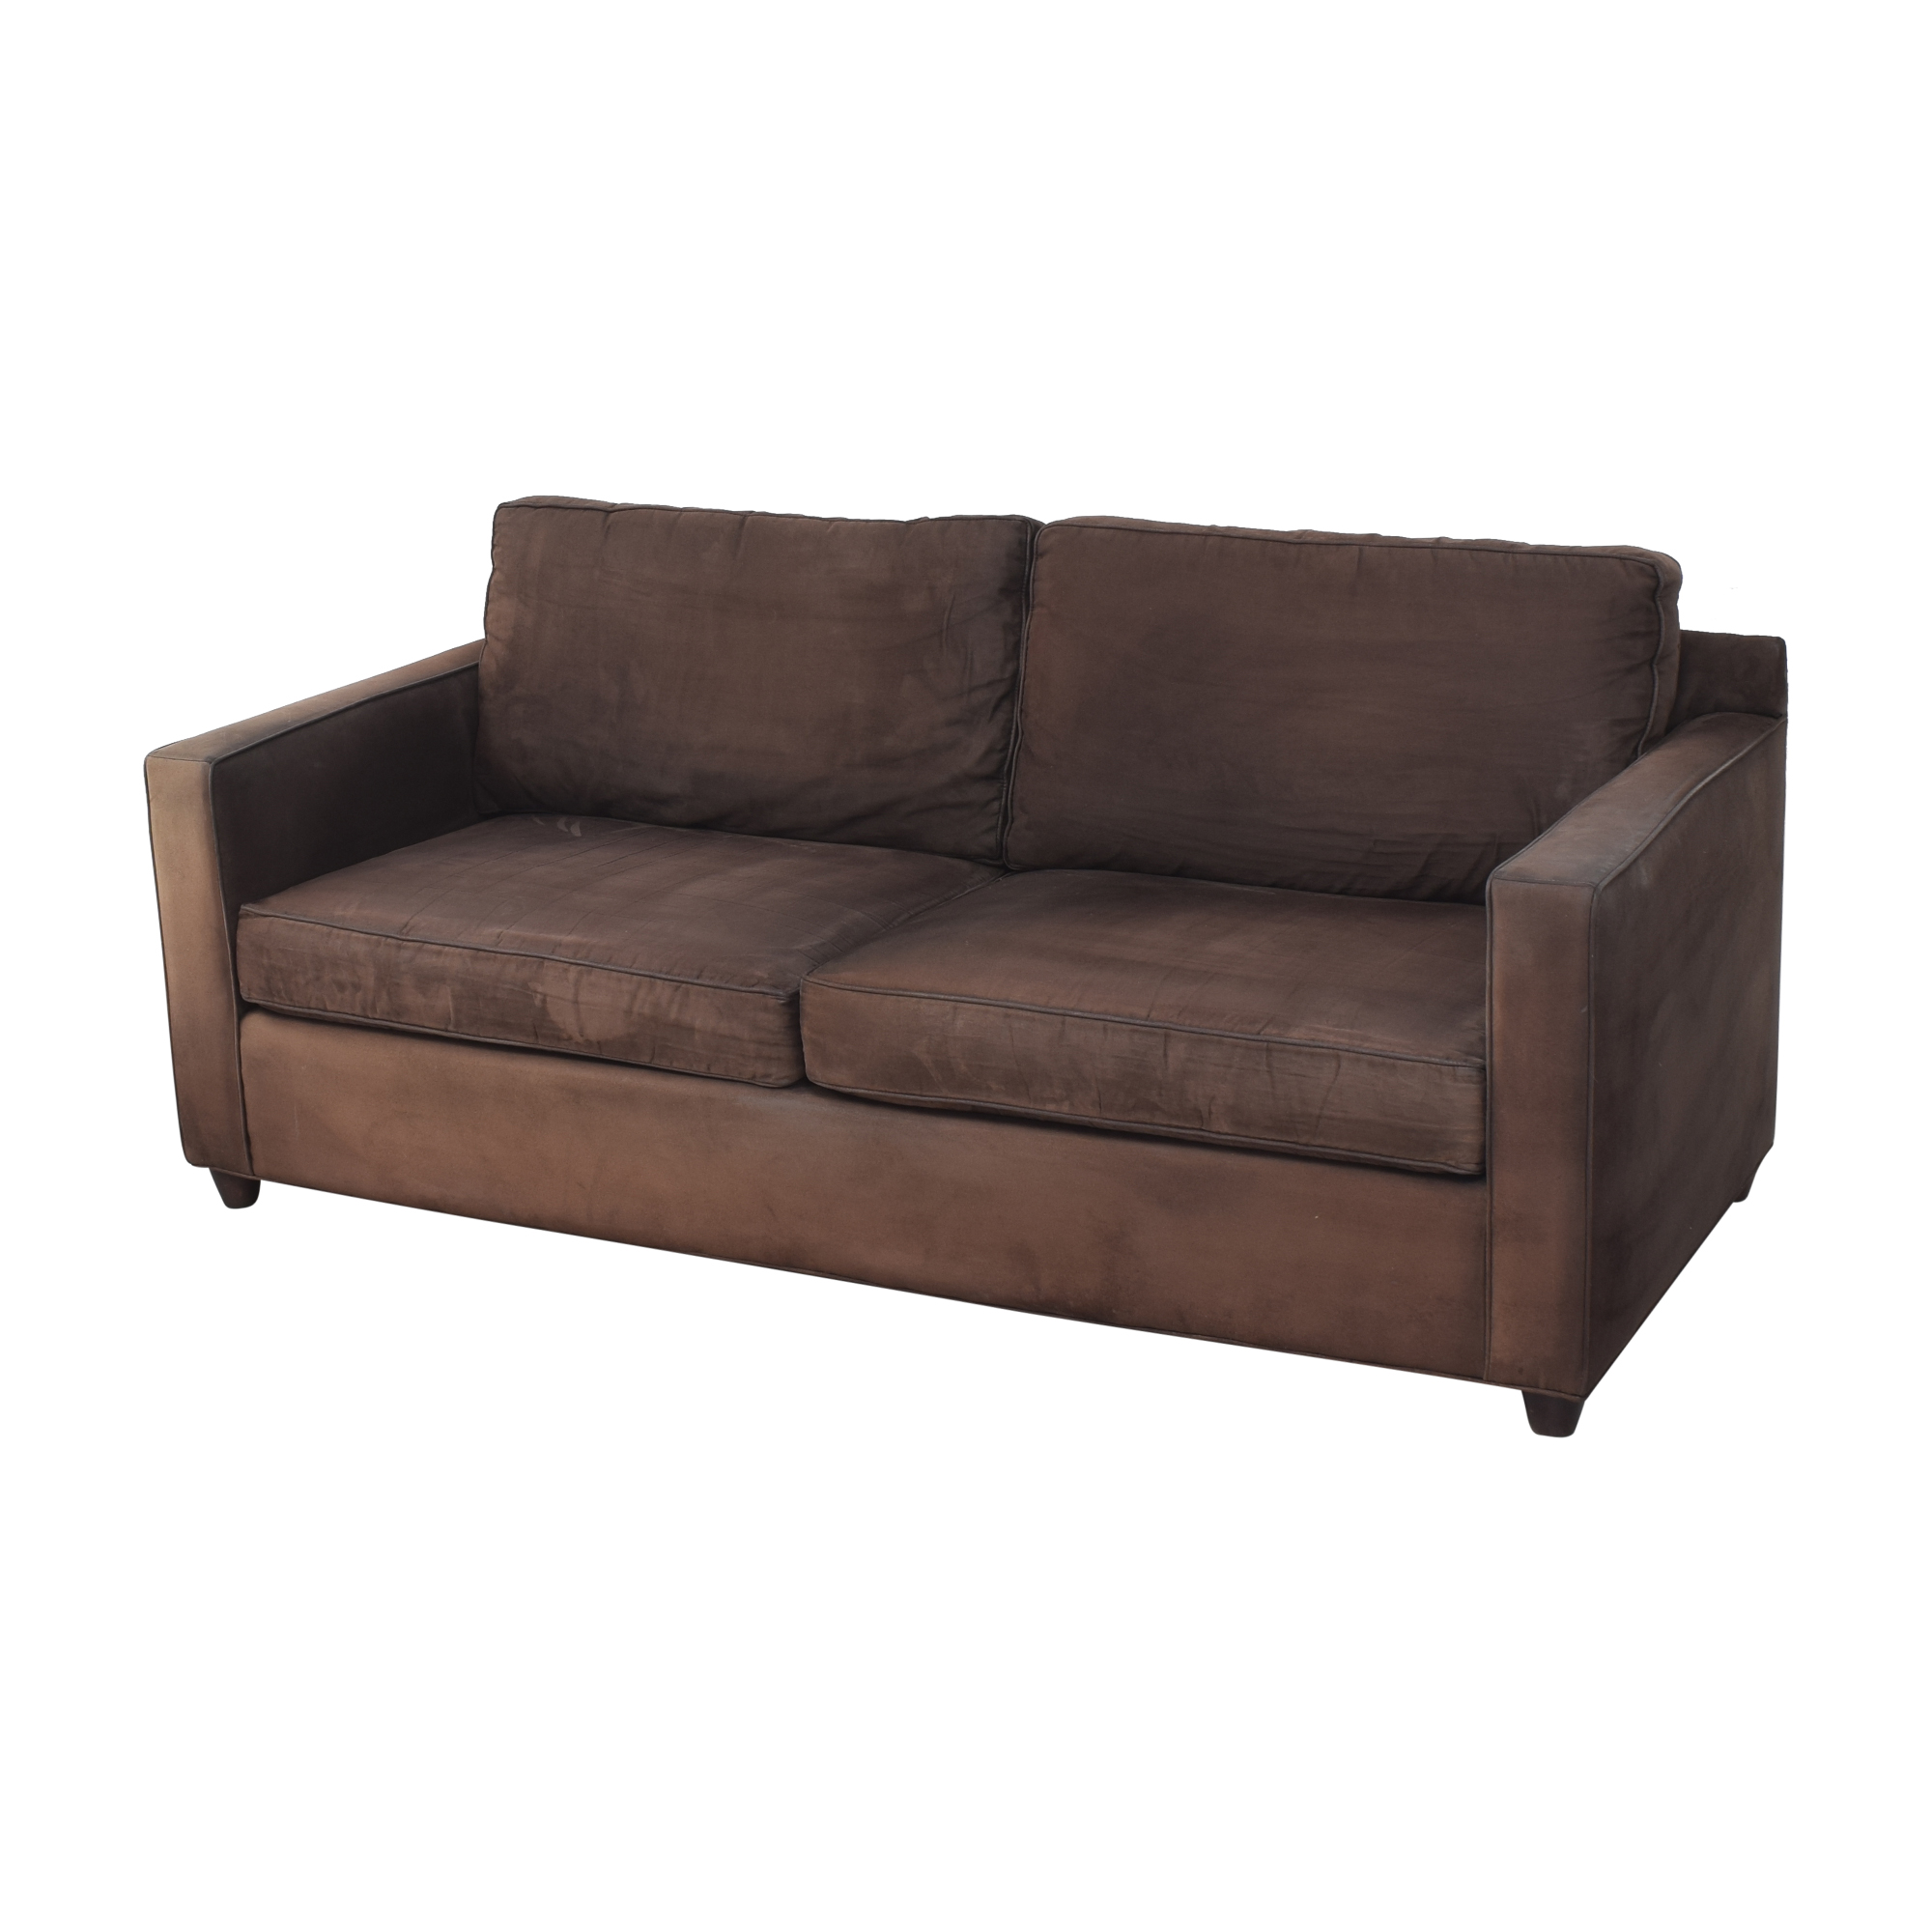 Crate & Barrel Barrett Two Cushion Sofa sale